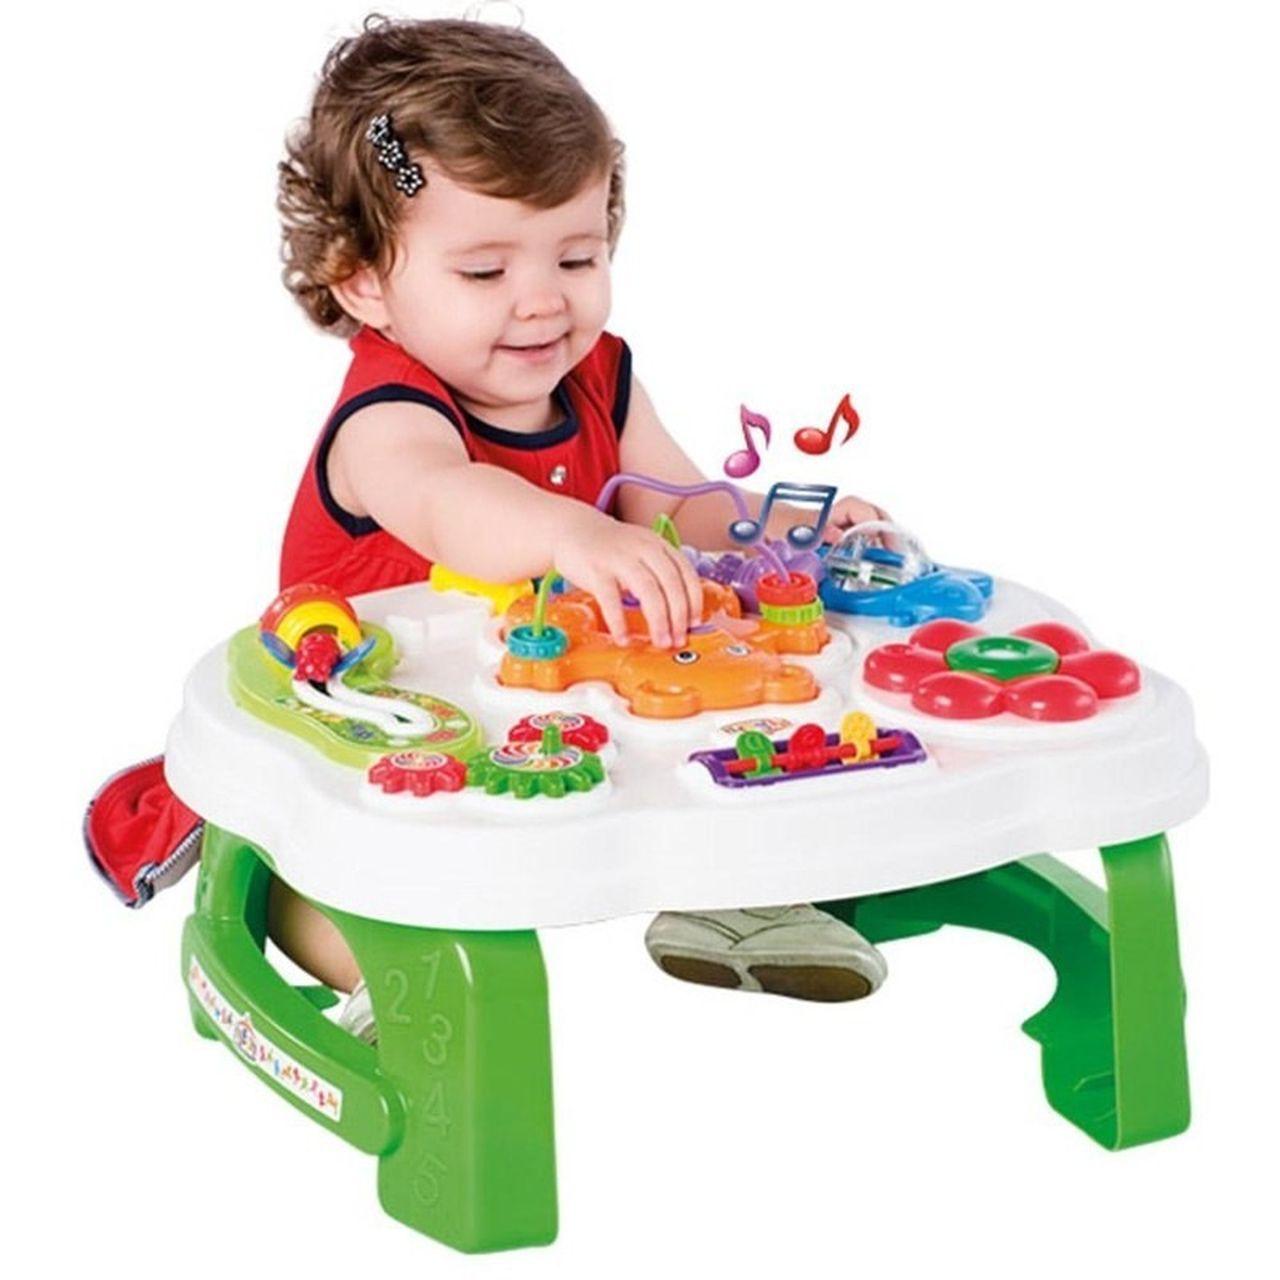 Mesinha de Atividades Infantil Smart Table - Tateti 812